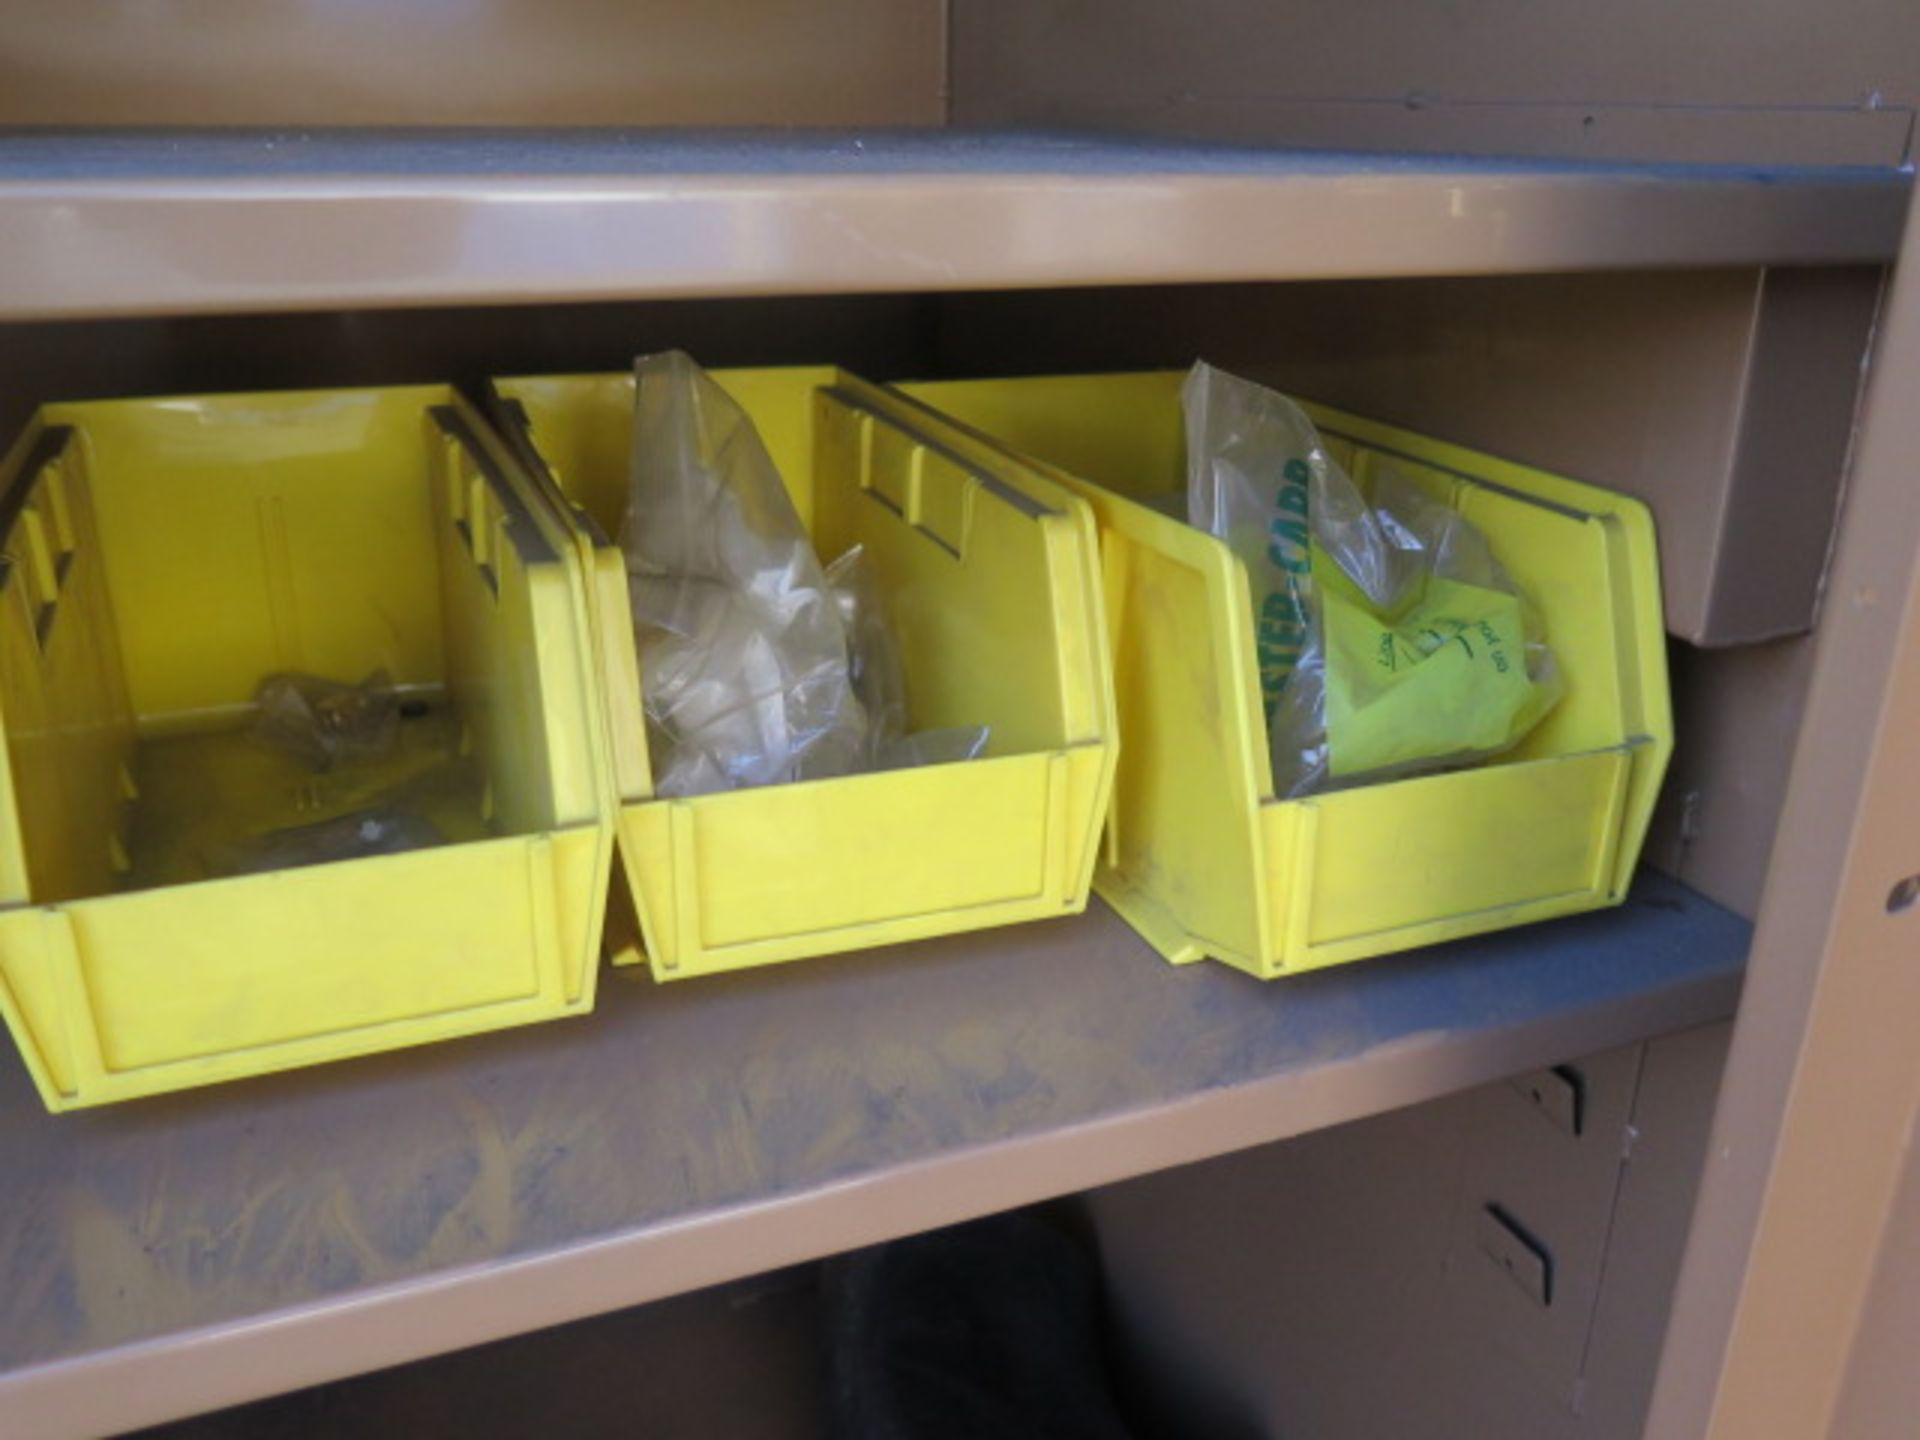 Knaack mdl. 139 Jobmaster Job Box (SOLD AS-IS - NO WARRANTY) - Image 10 of 17